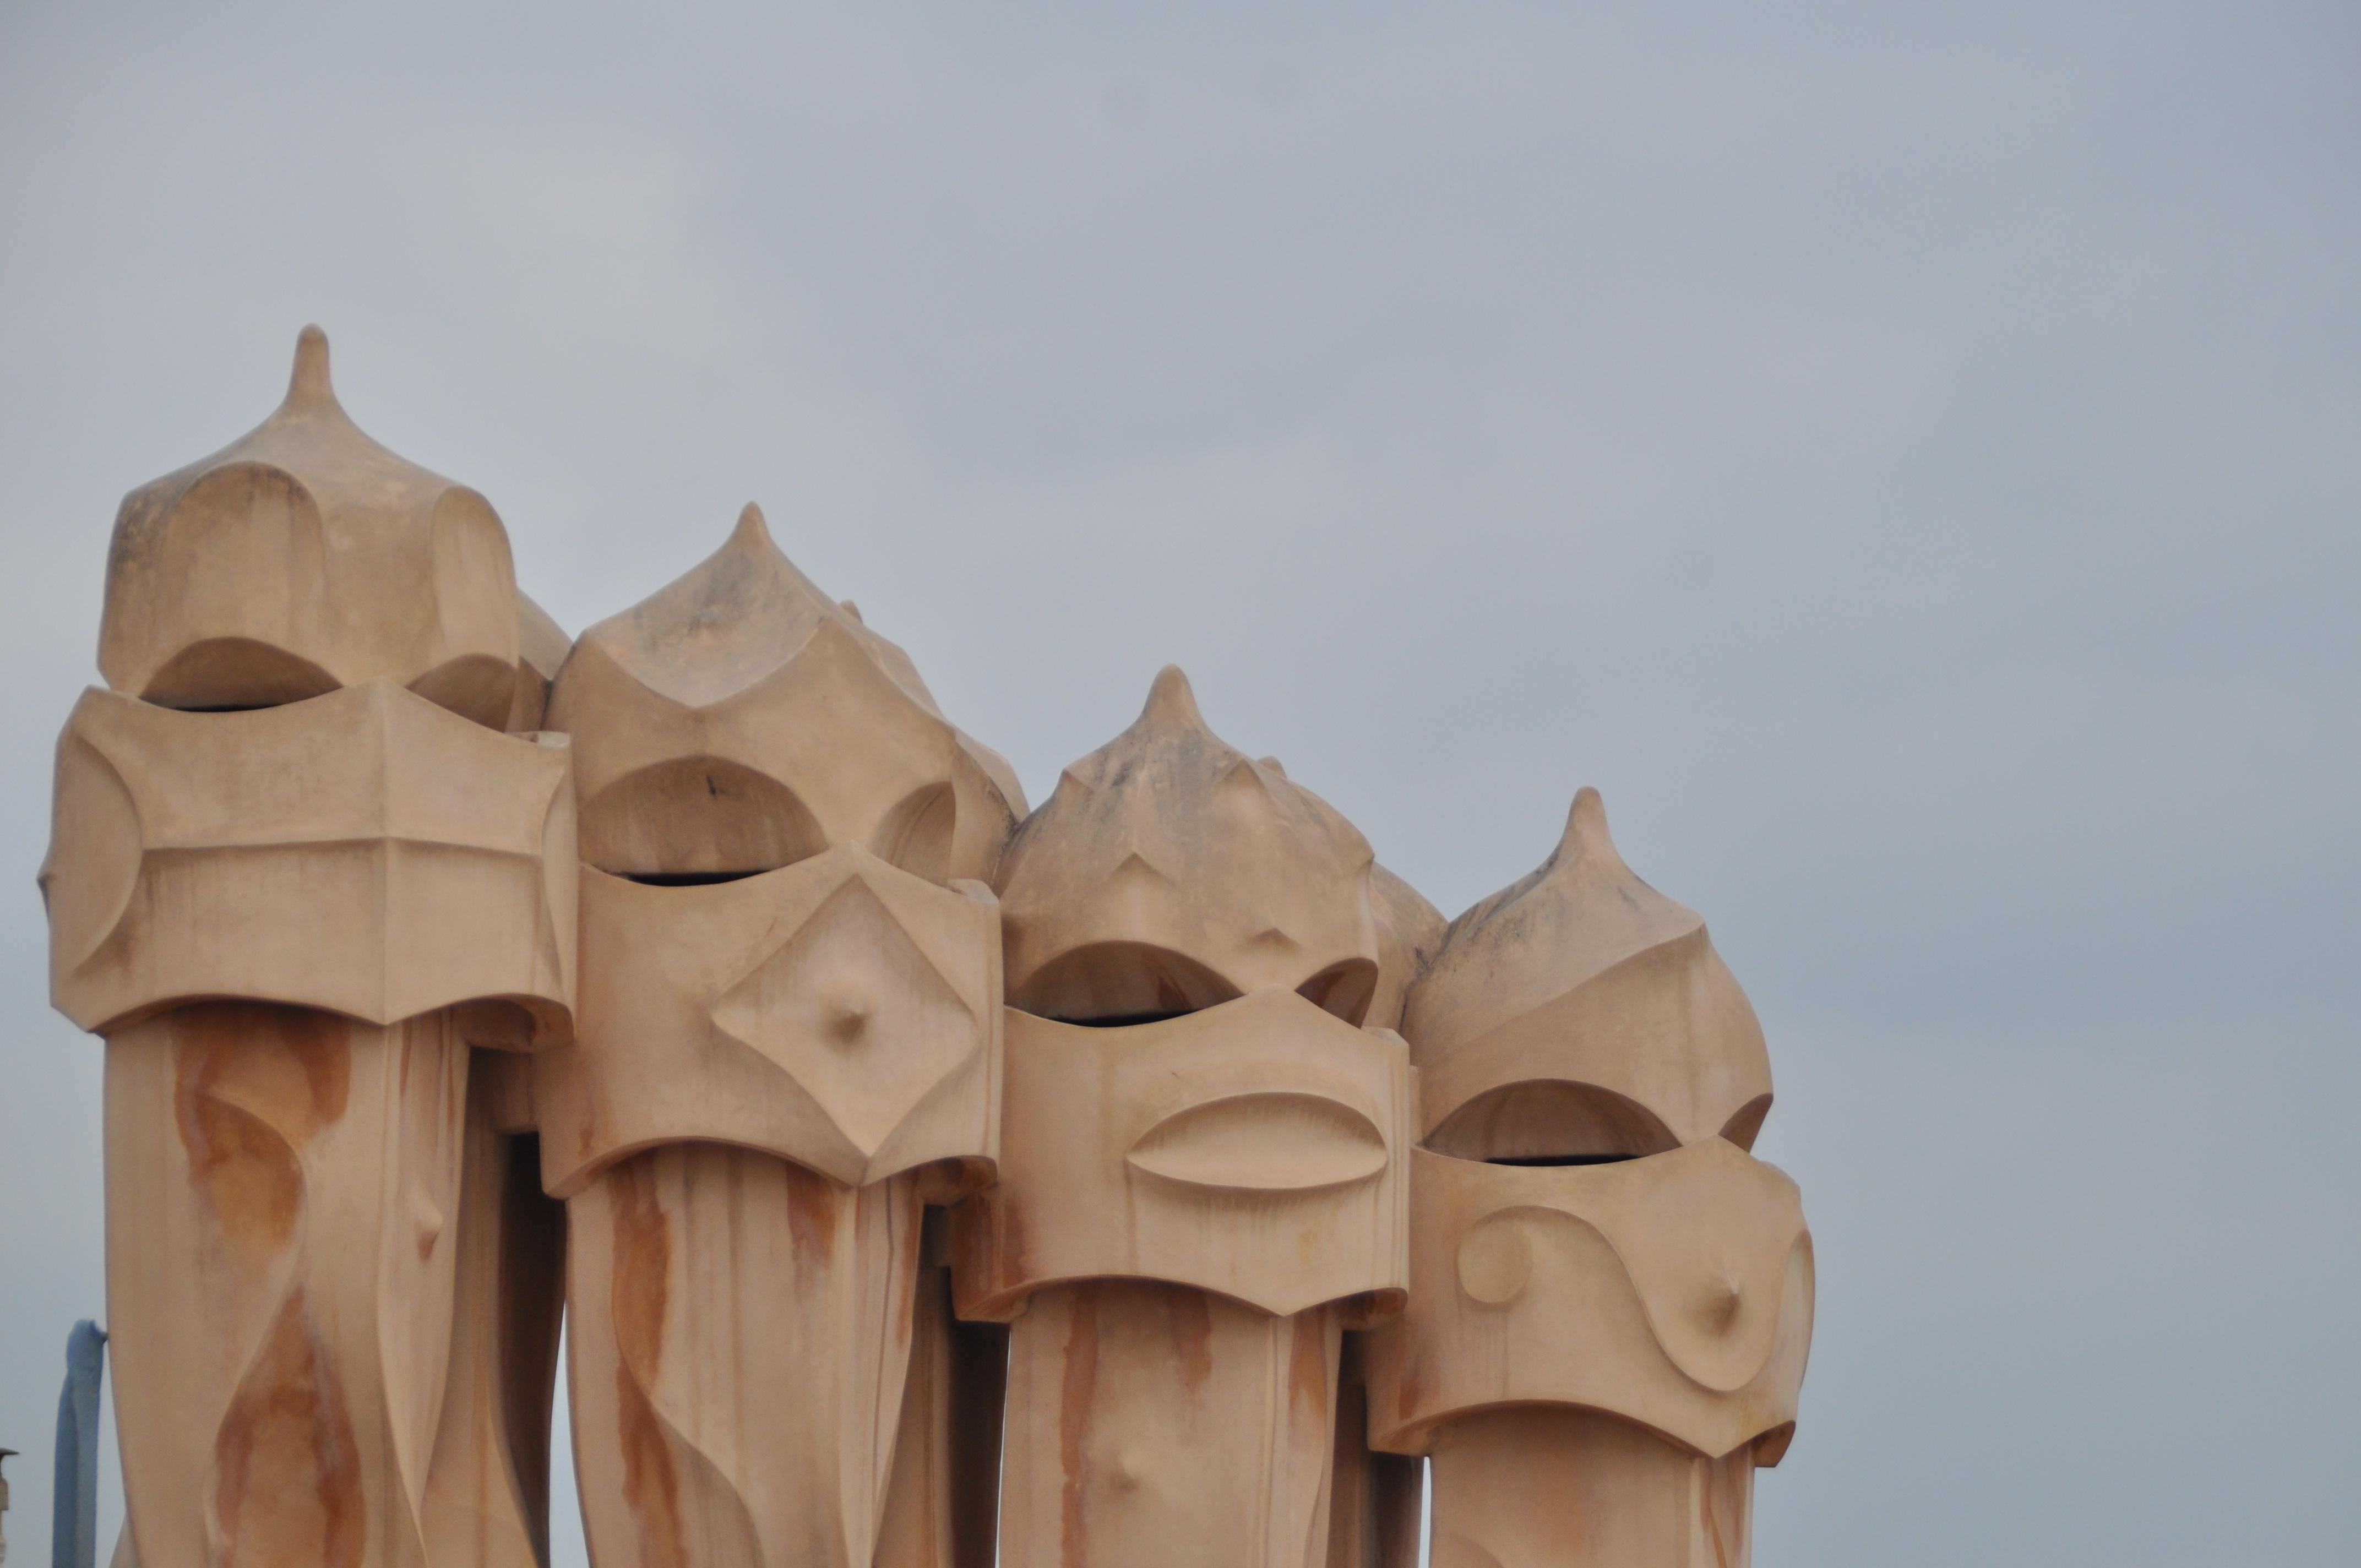 arena madera casa pared de piedra barcelona lugares de inters escultura art espaa divertido templo